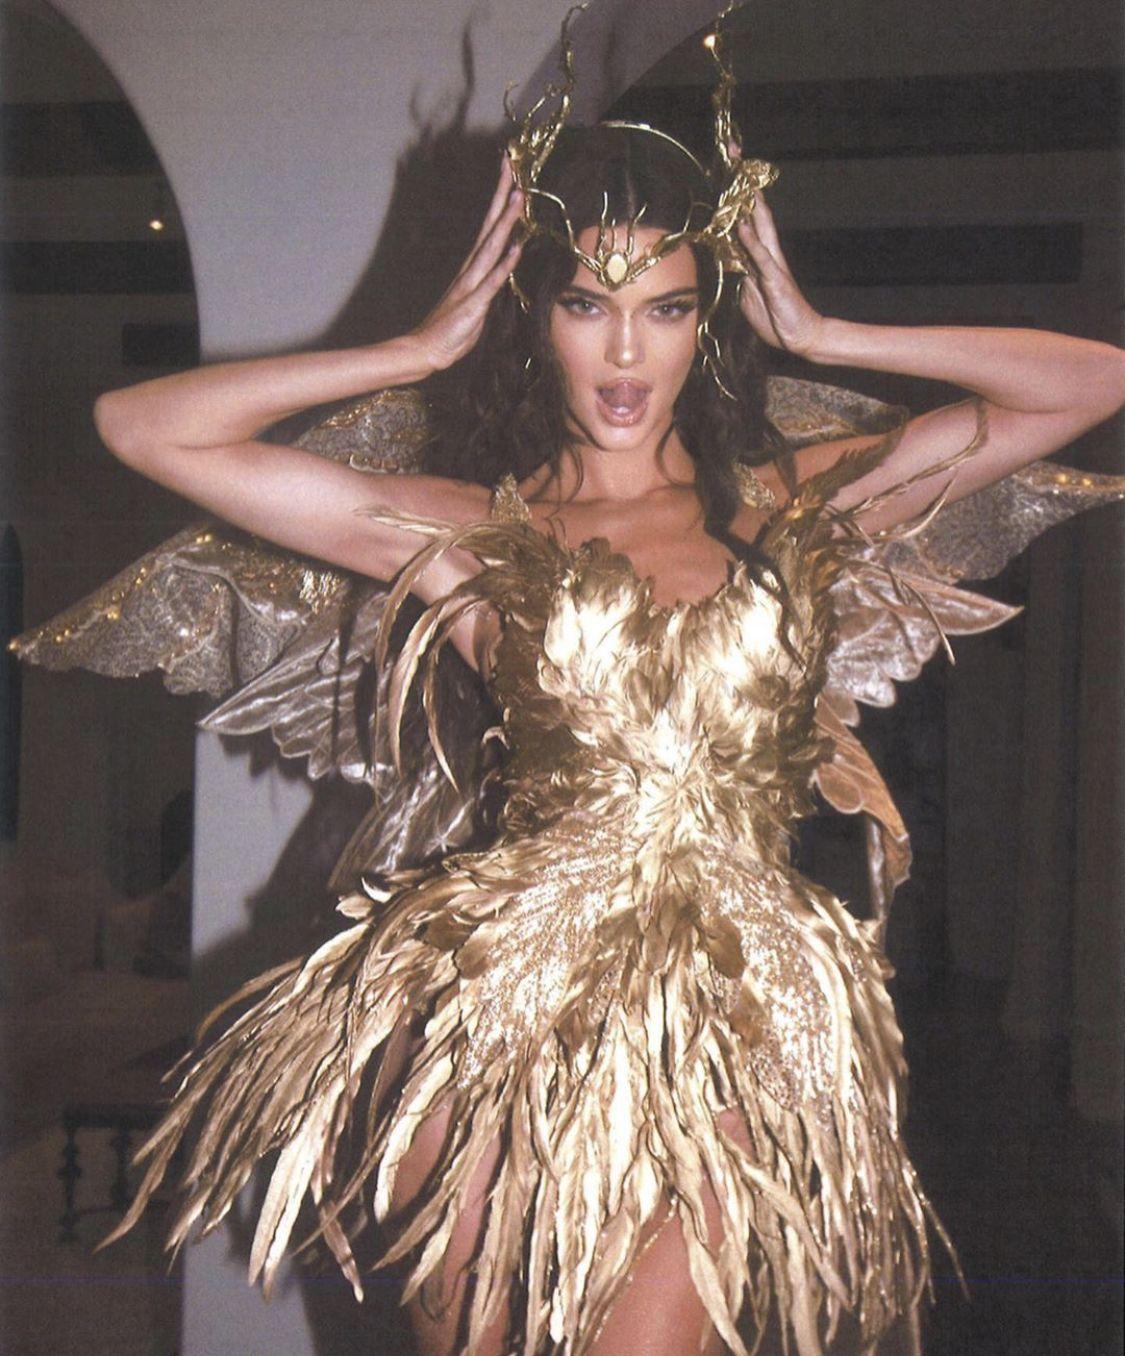 Kylie Jenner Wore Three OvertheTop Costumes Yesterday